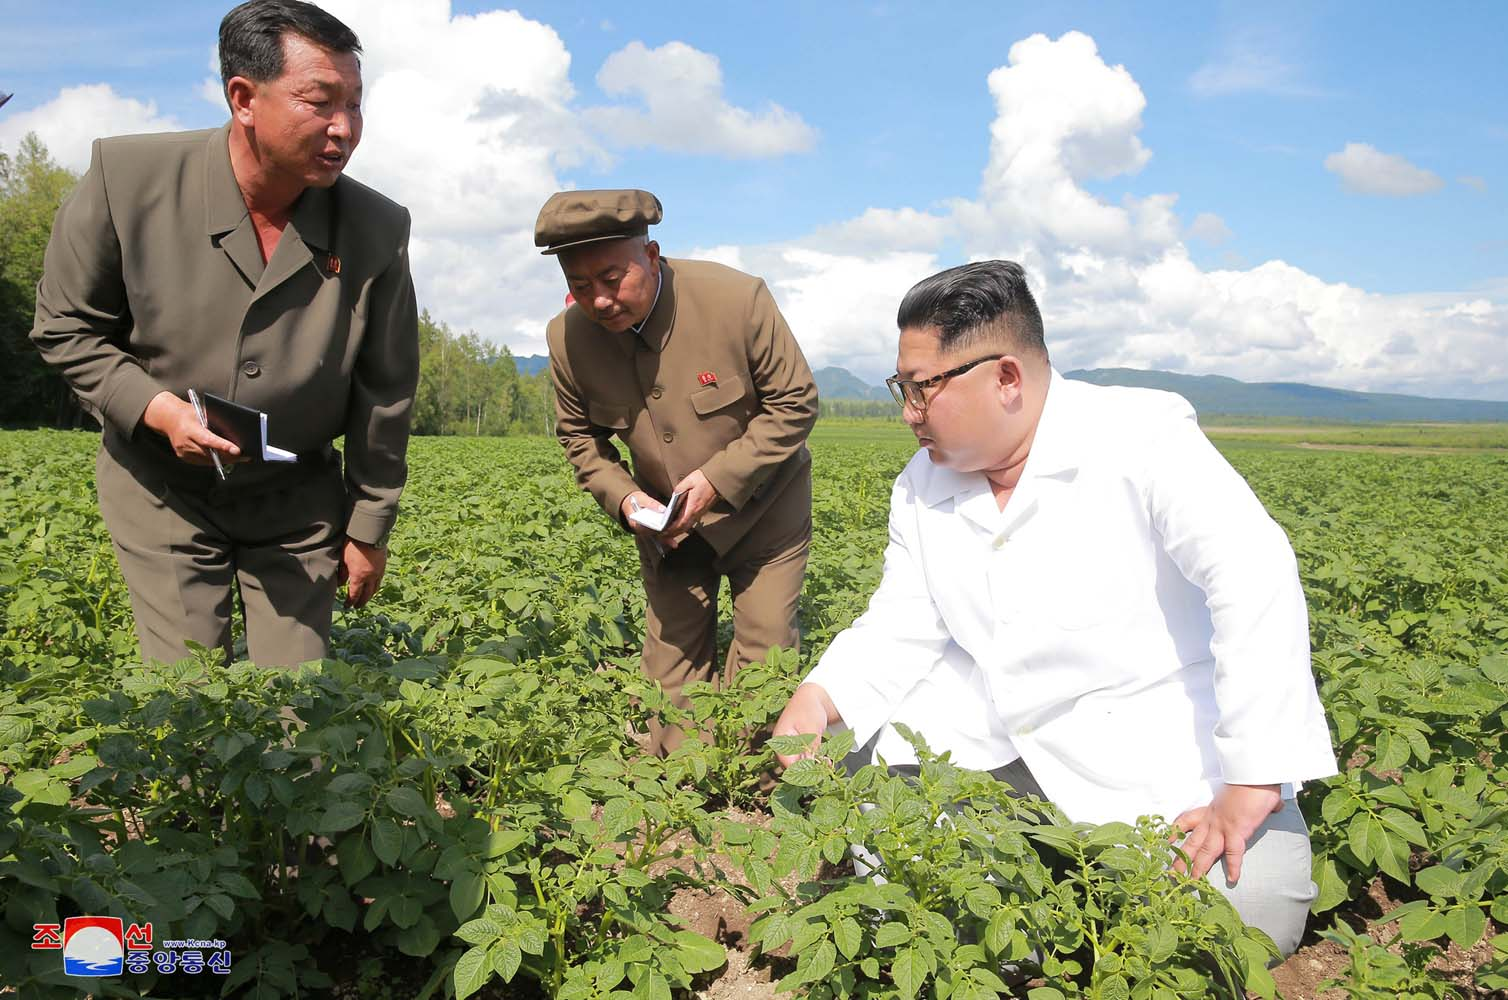 North Korea's Korean Central News Agency